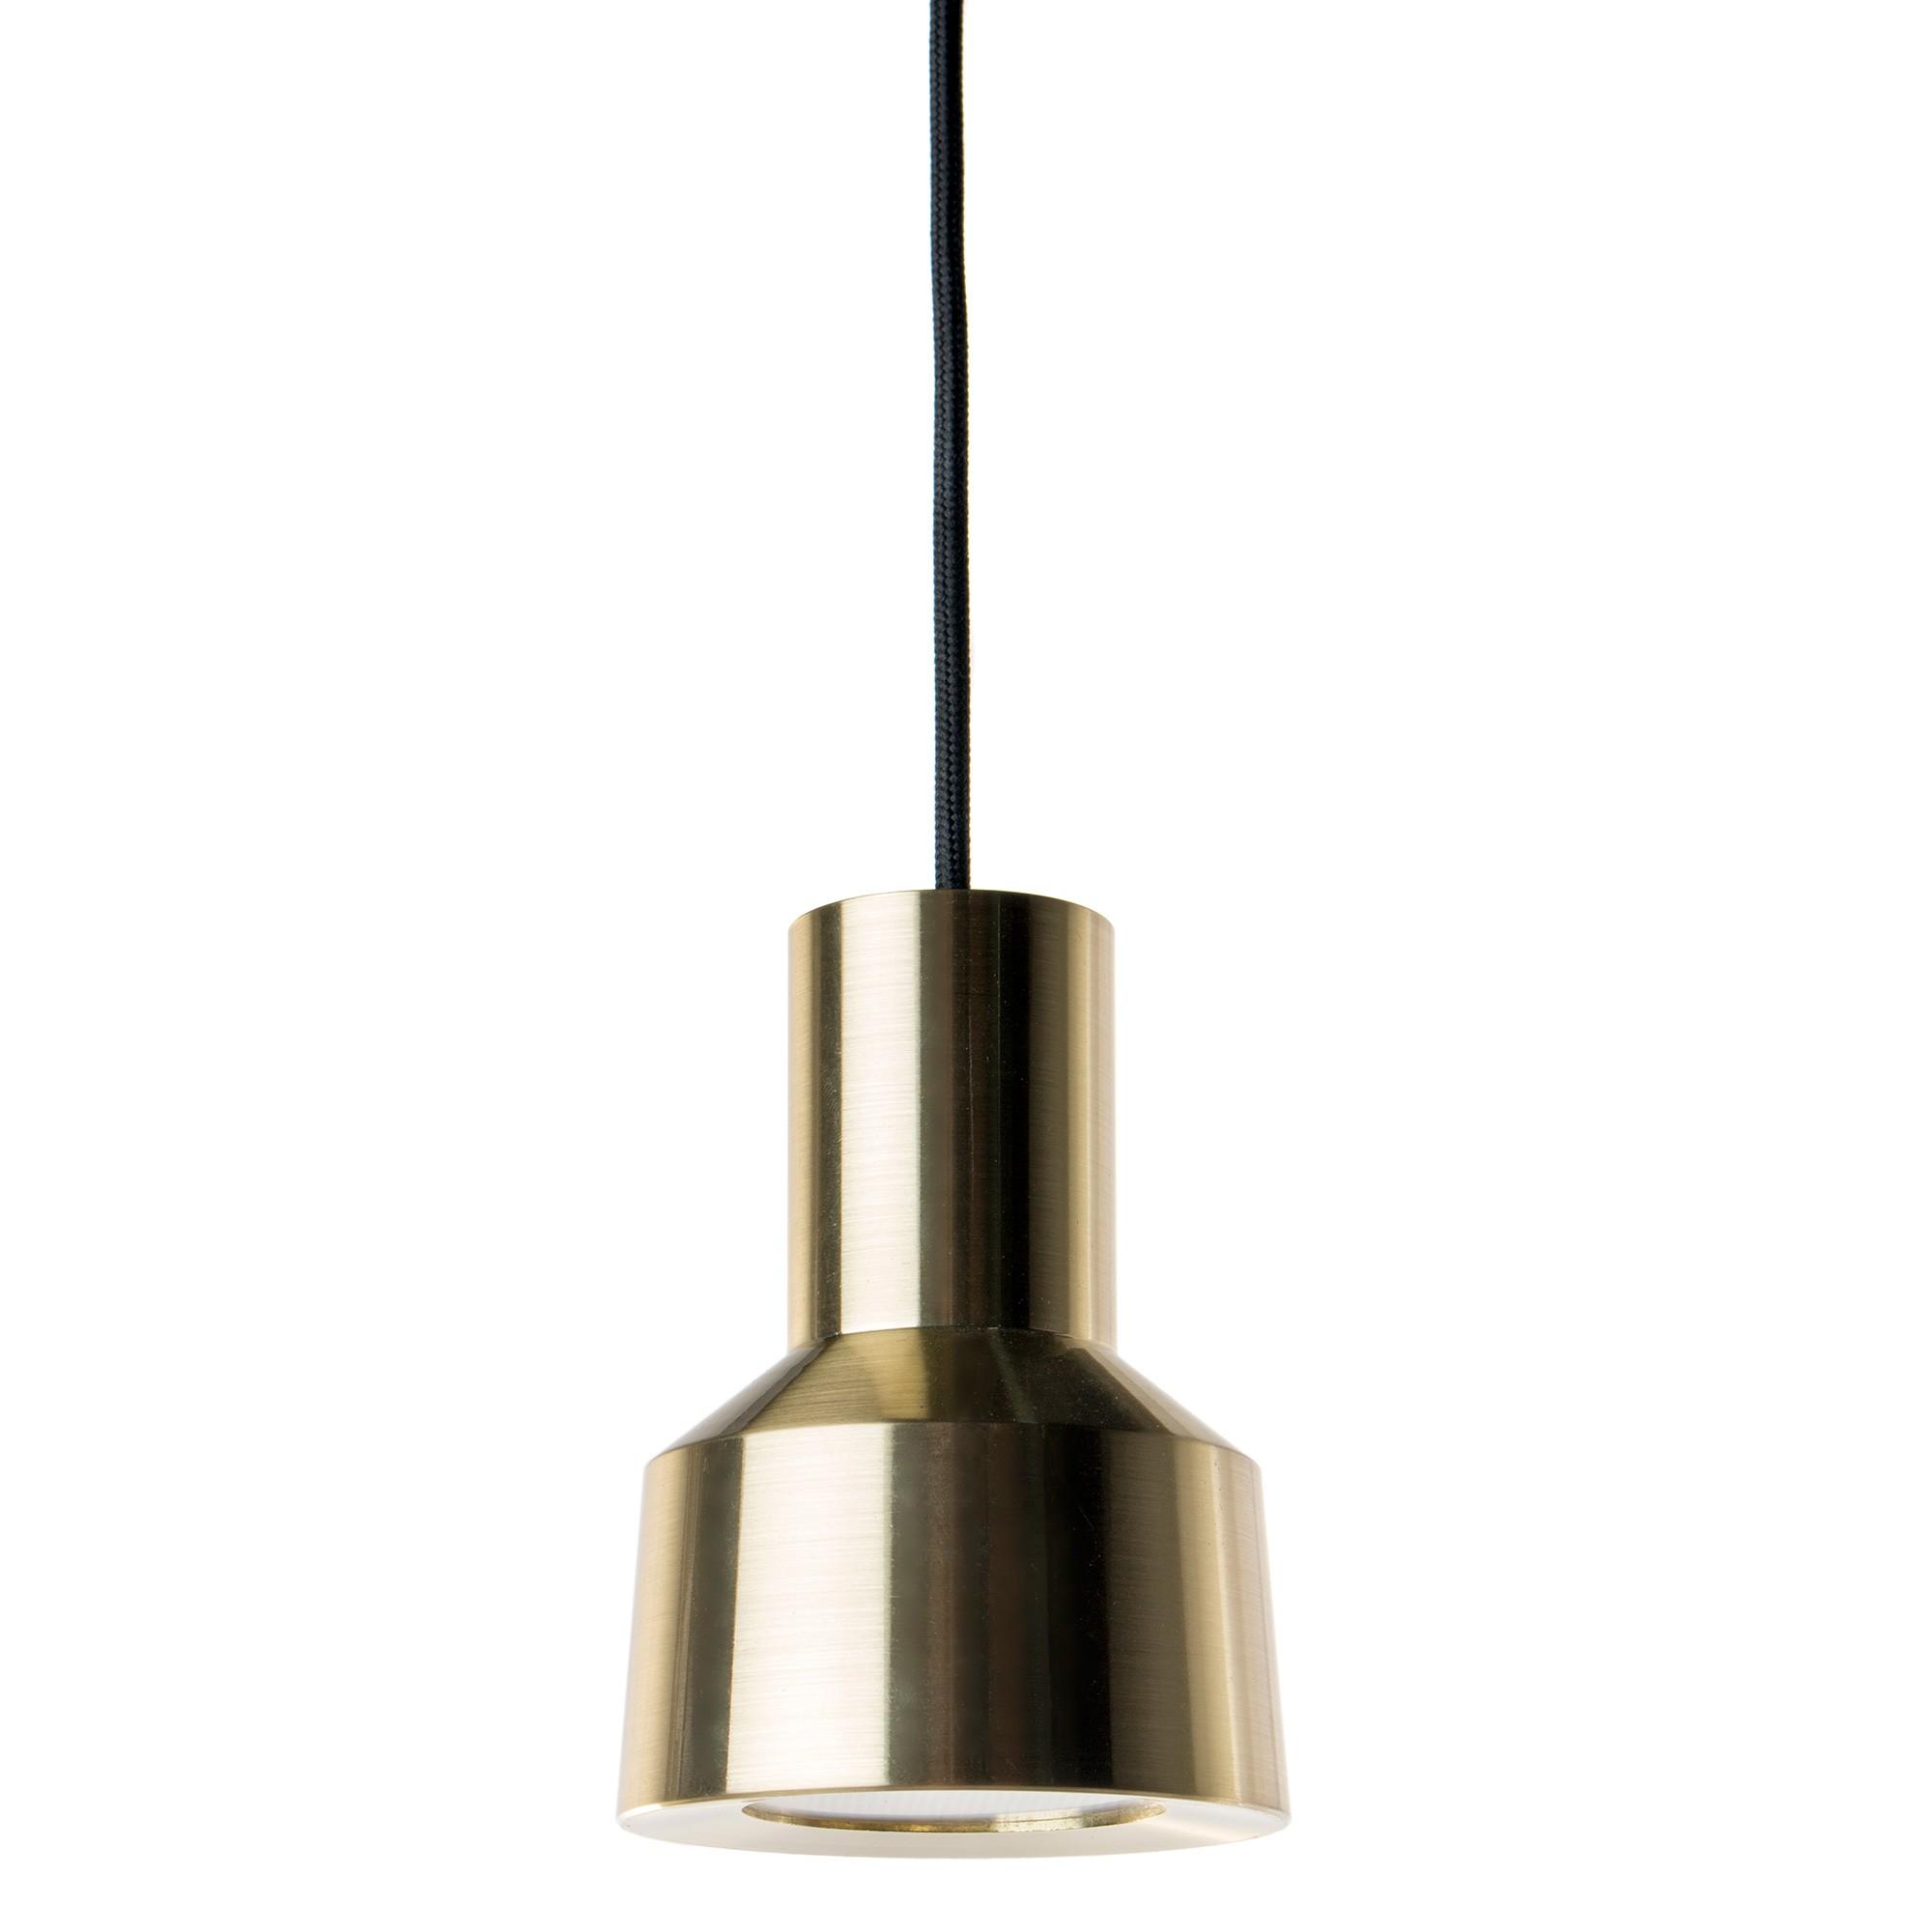 Neuron LED Metal Pendant Light, Brass